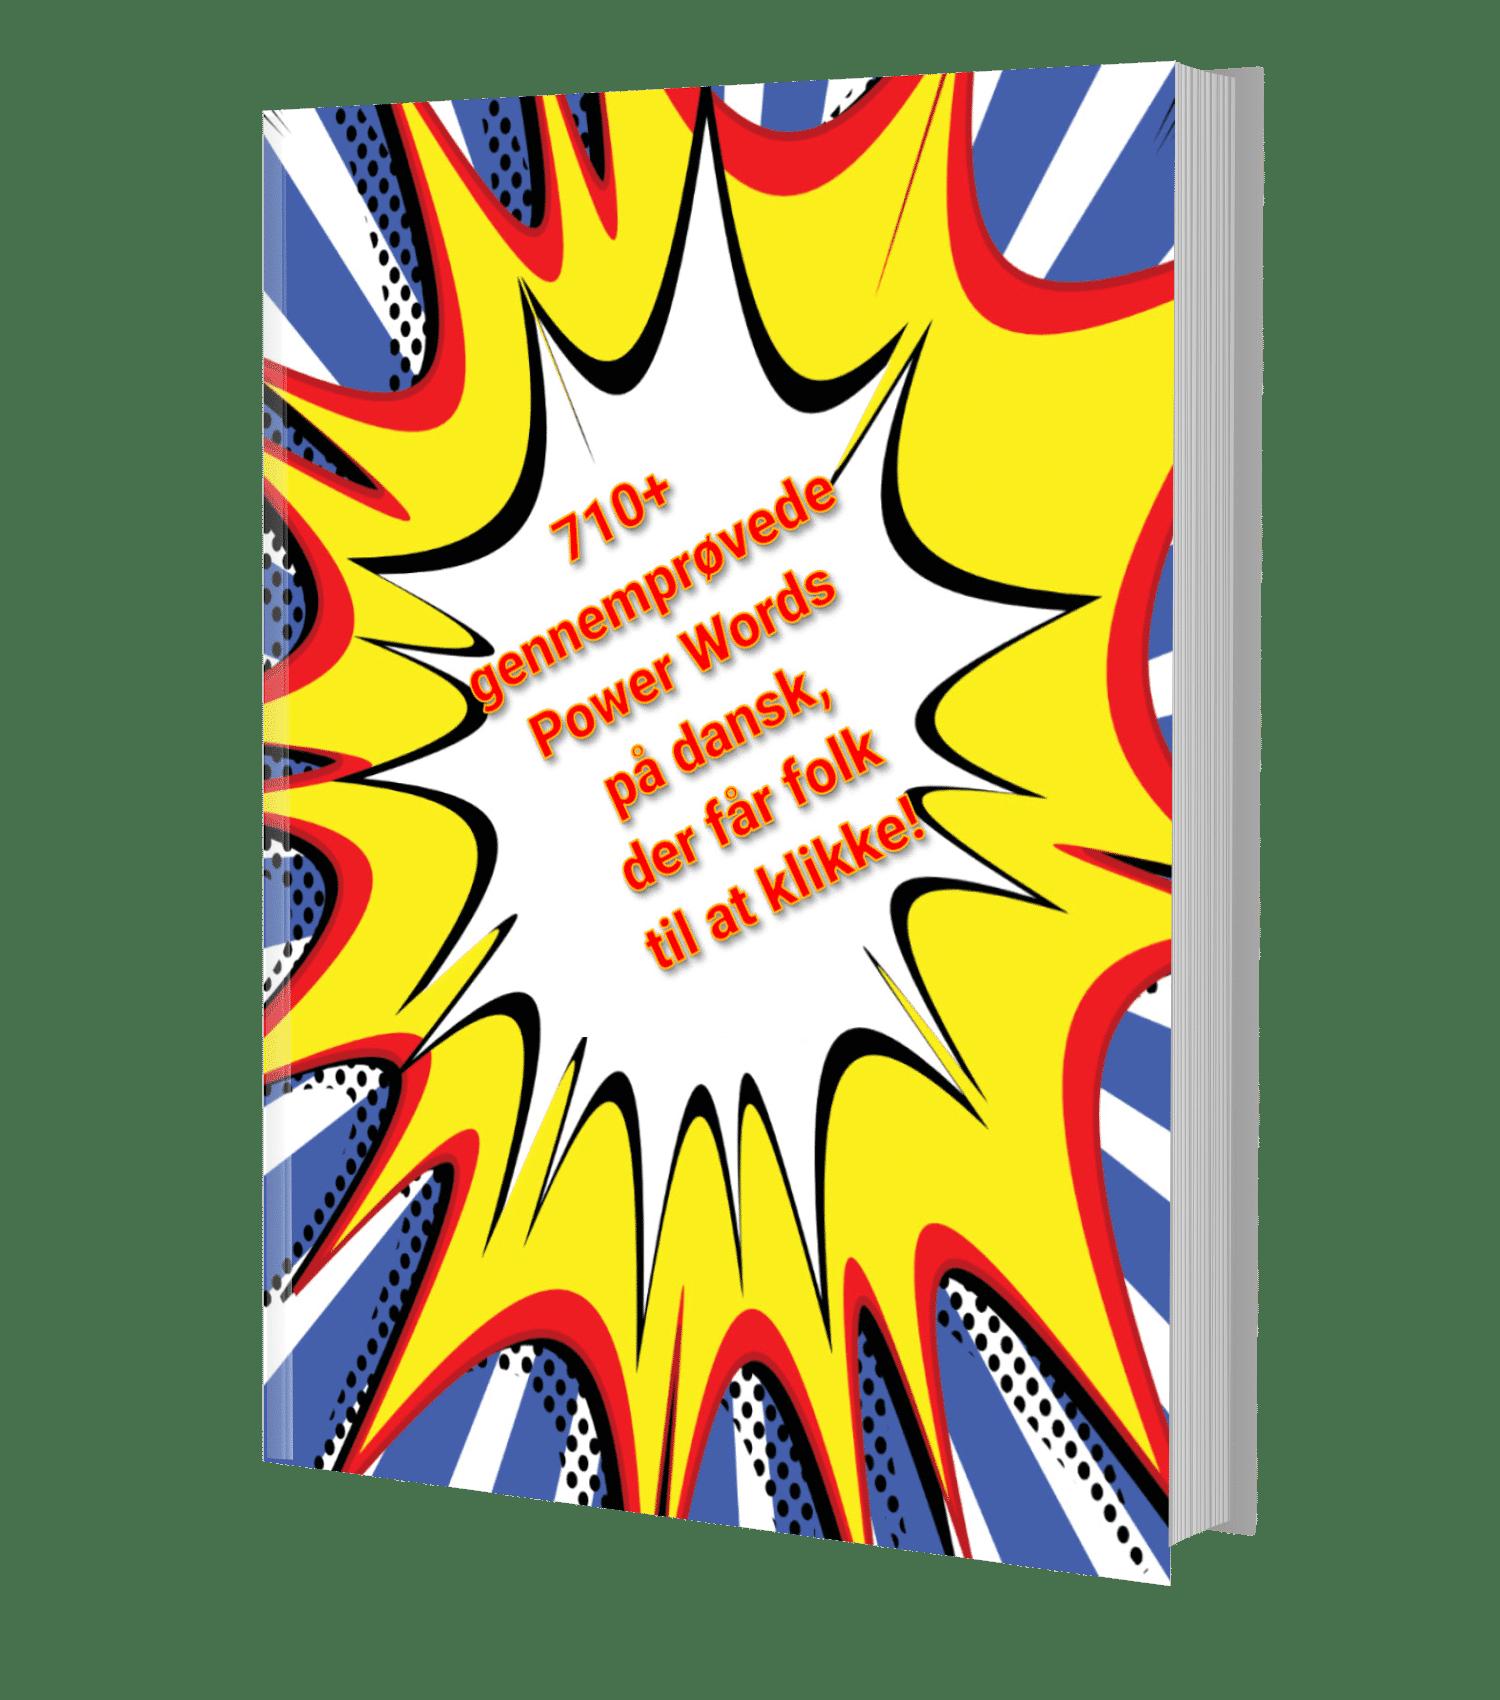 710+ Power Words på dansk i gratis e-bog